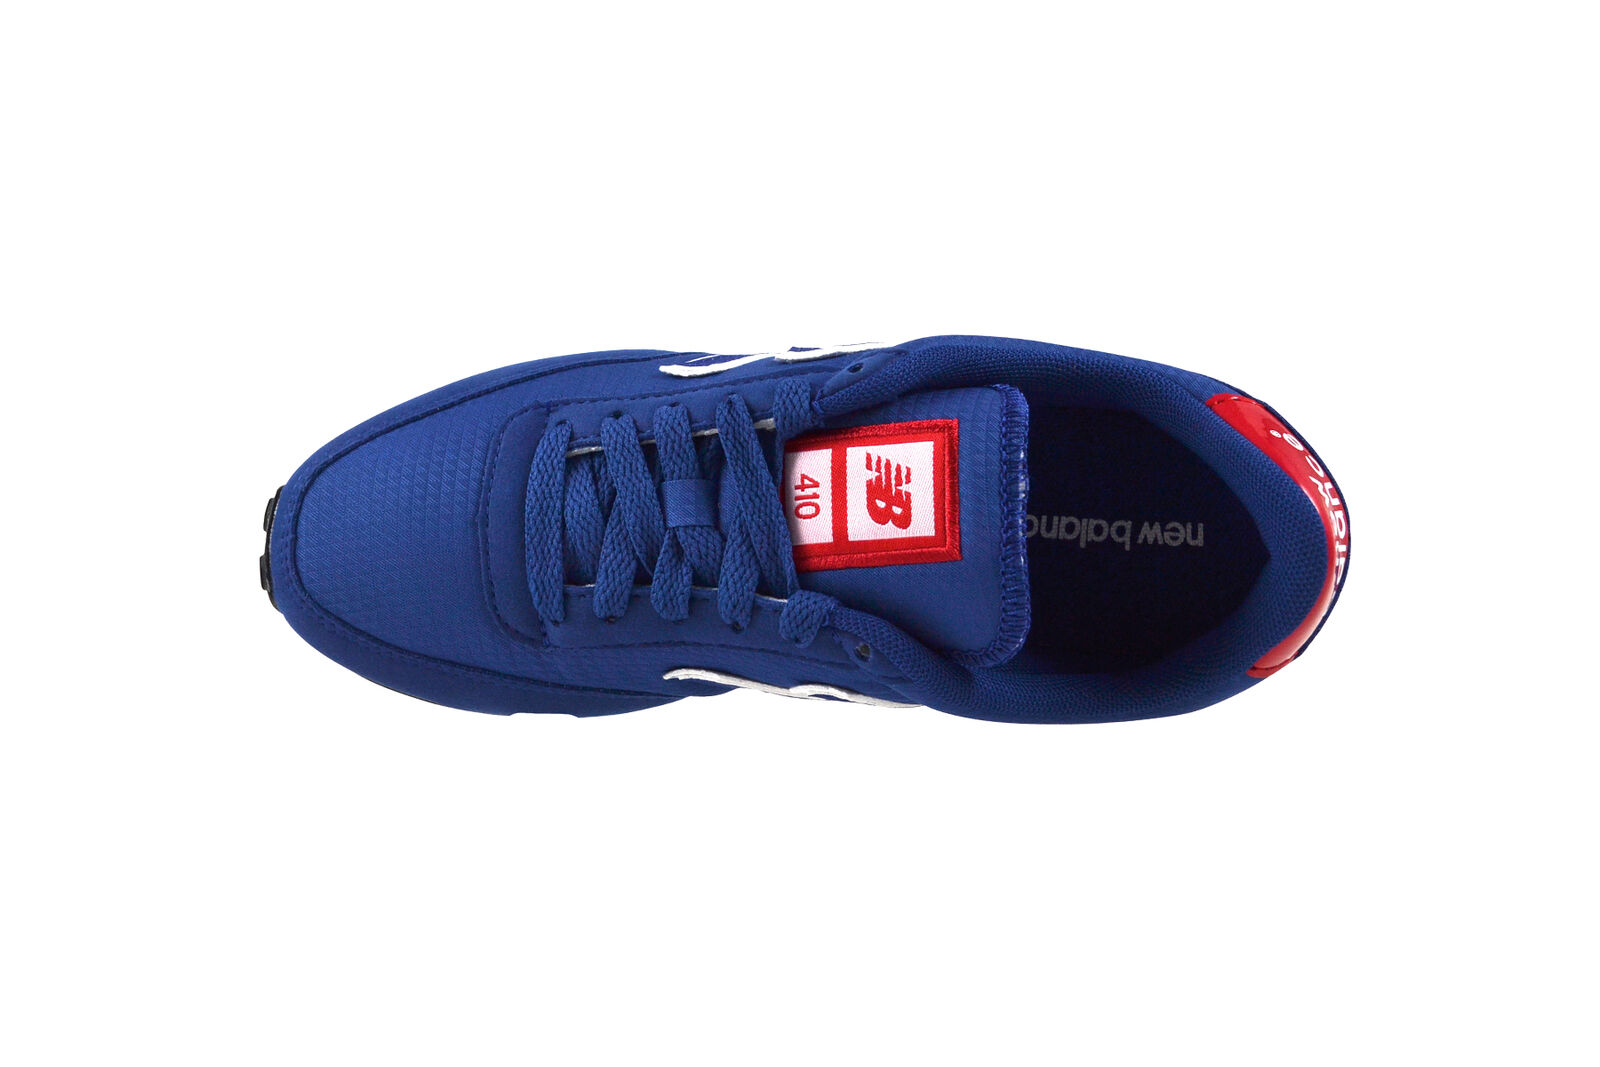 New Balance U410 RIB RIB U410 navy Schuhe/Turnschuhe blau 3a4c41